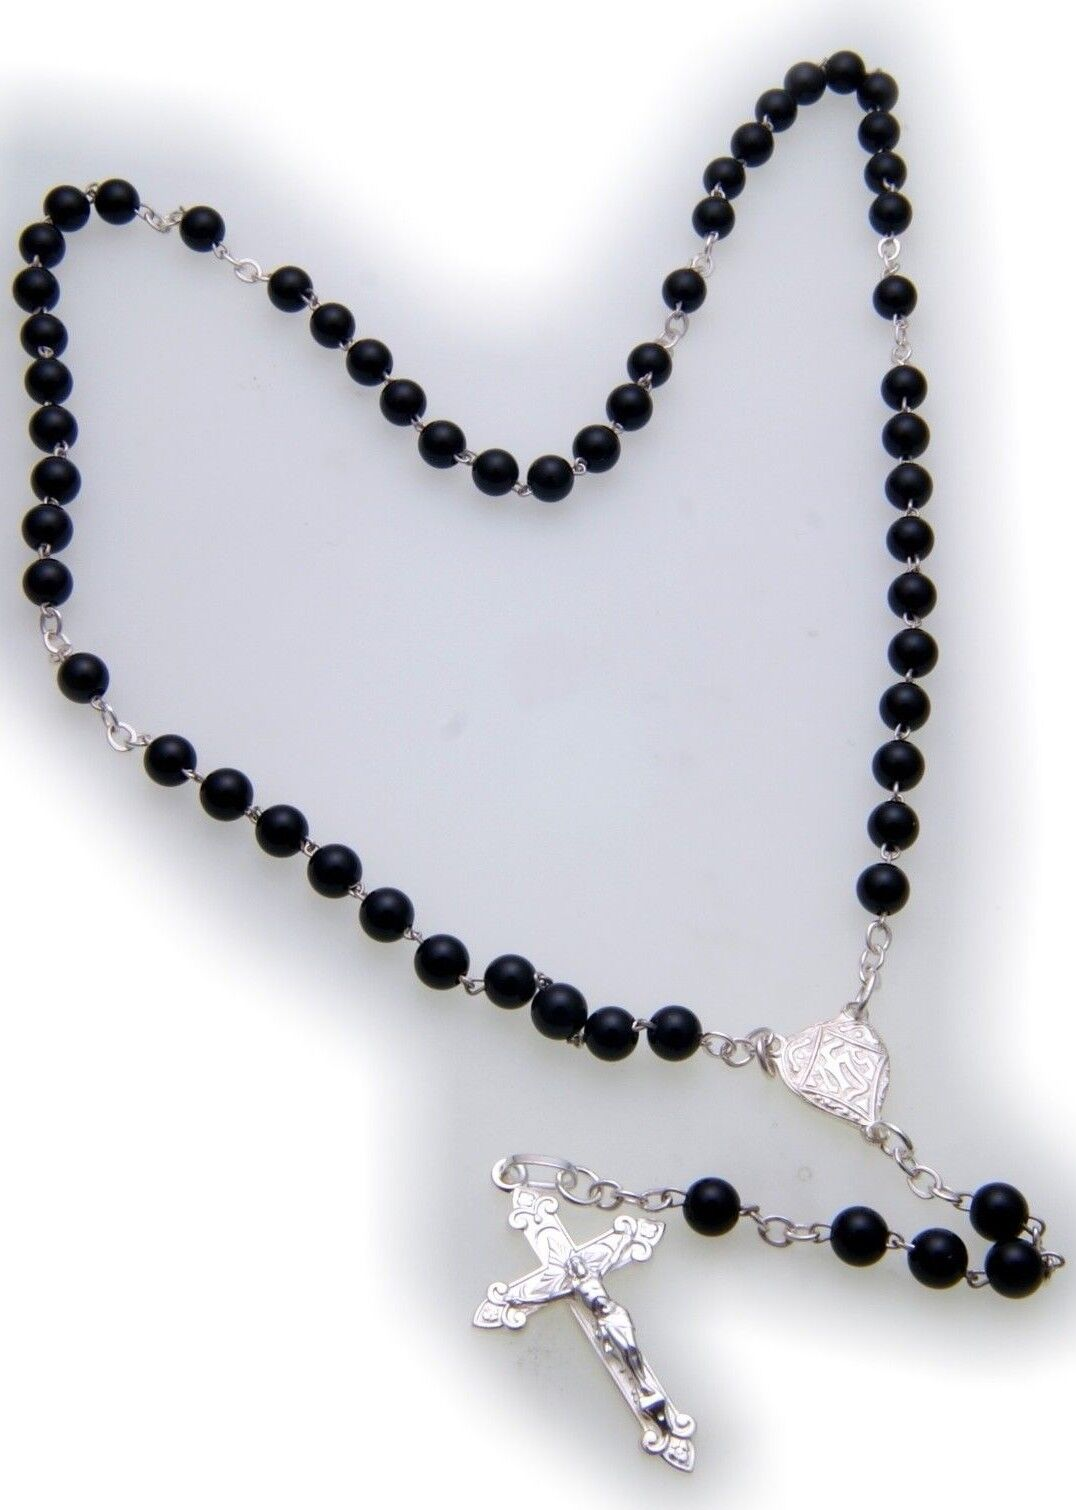 Halskette pinknkranz Kreuz Jesus silver 925 Sterlingsilver Onyx Kugel Unisex